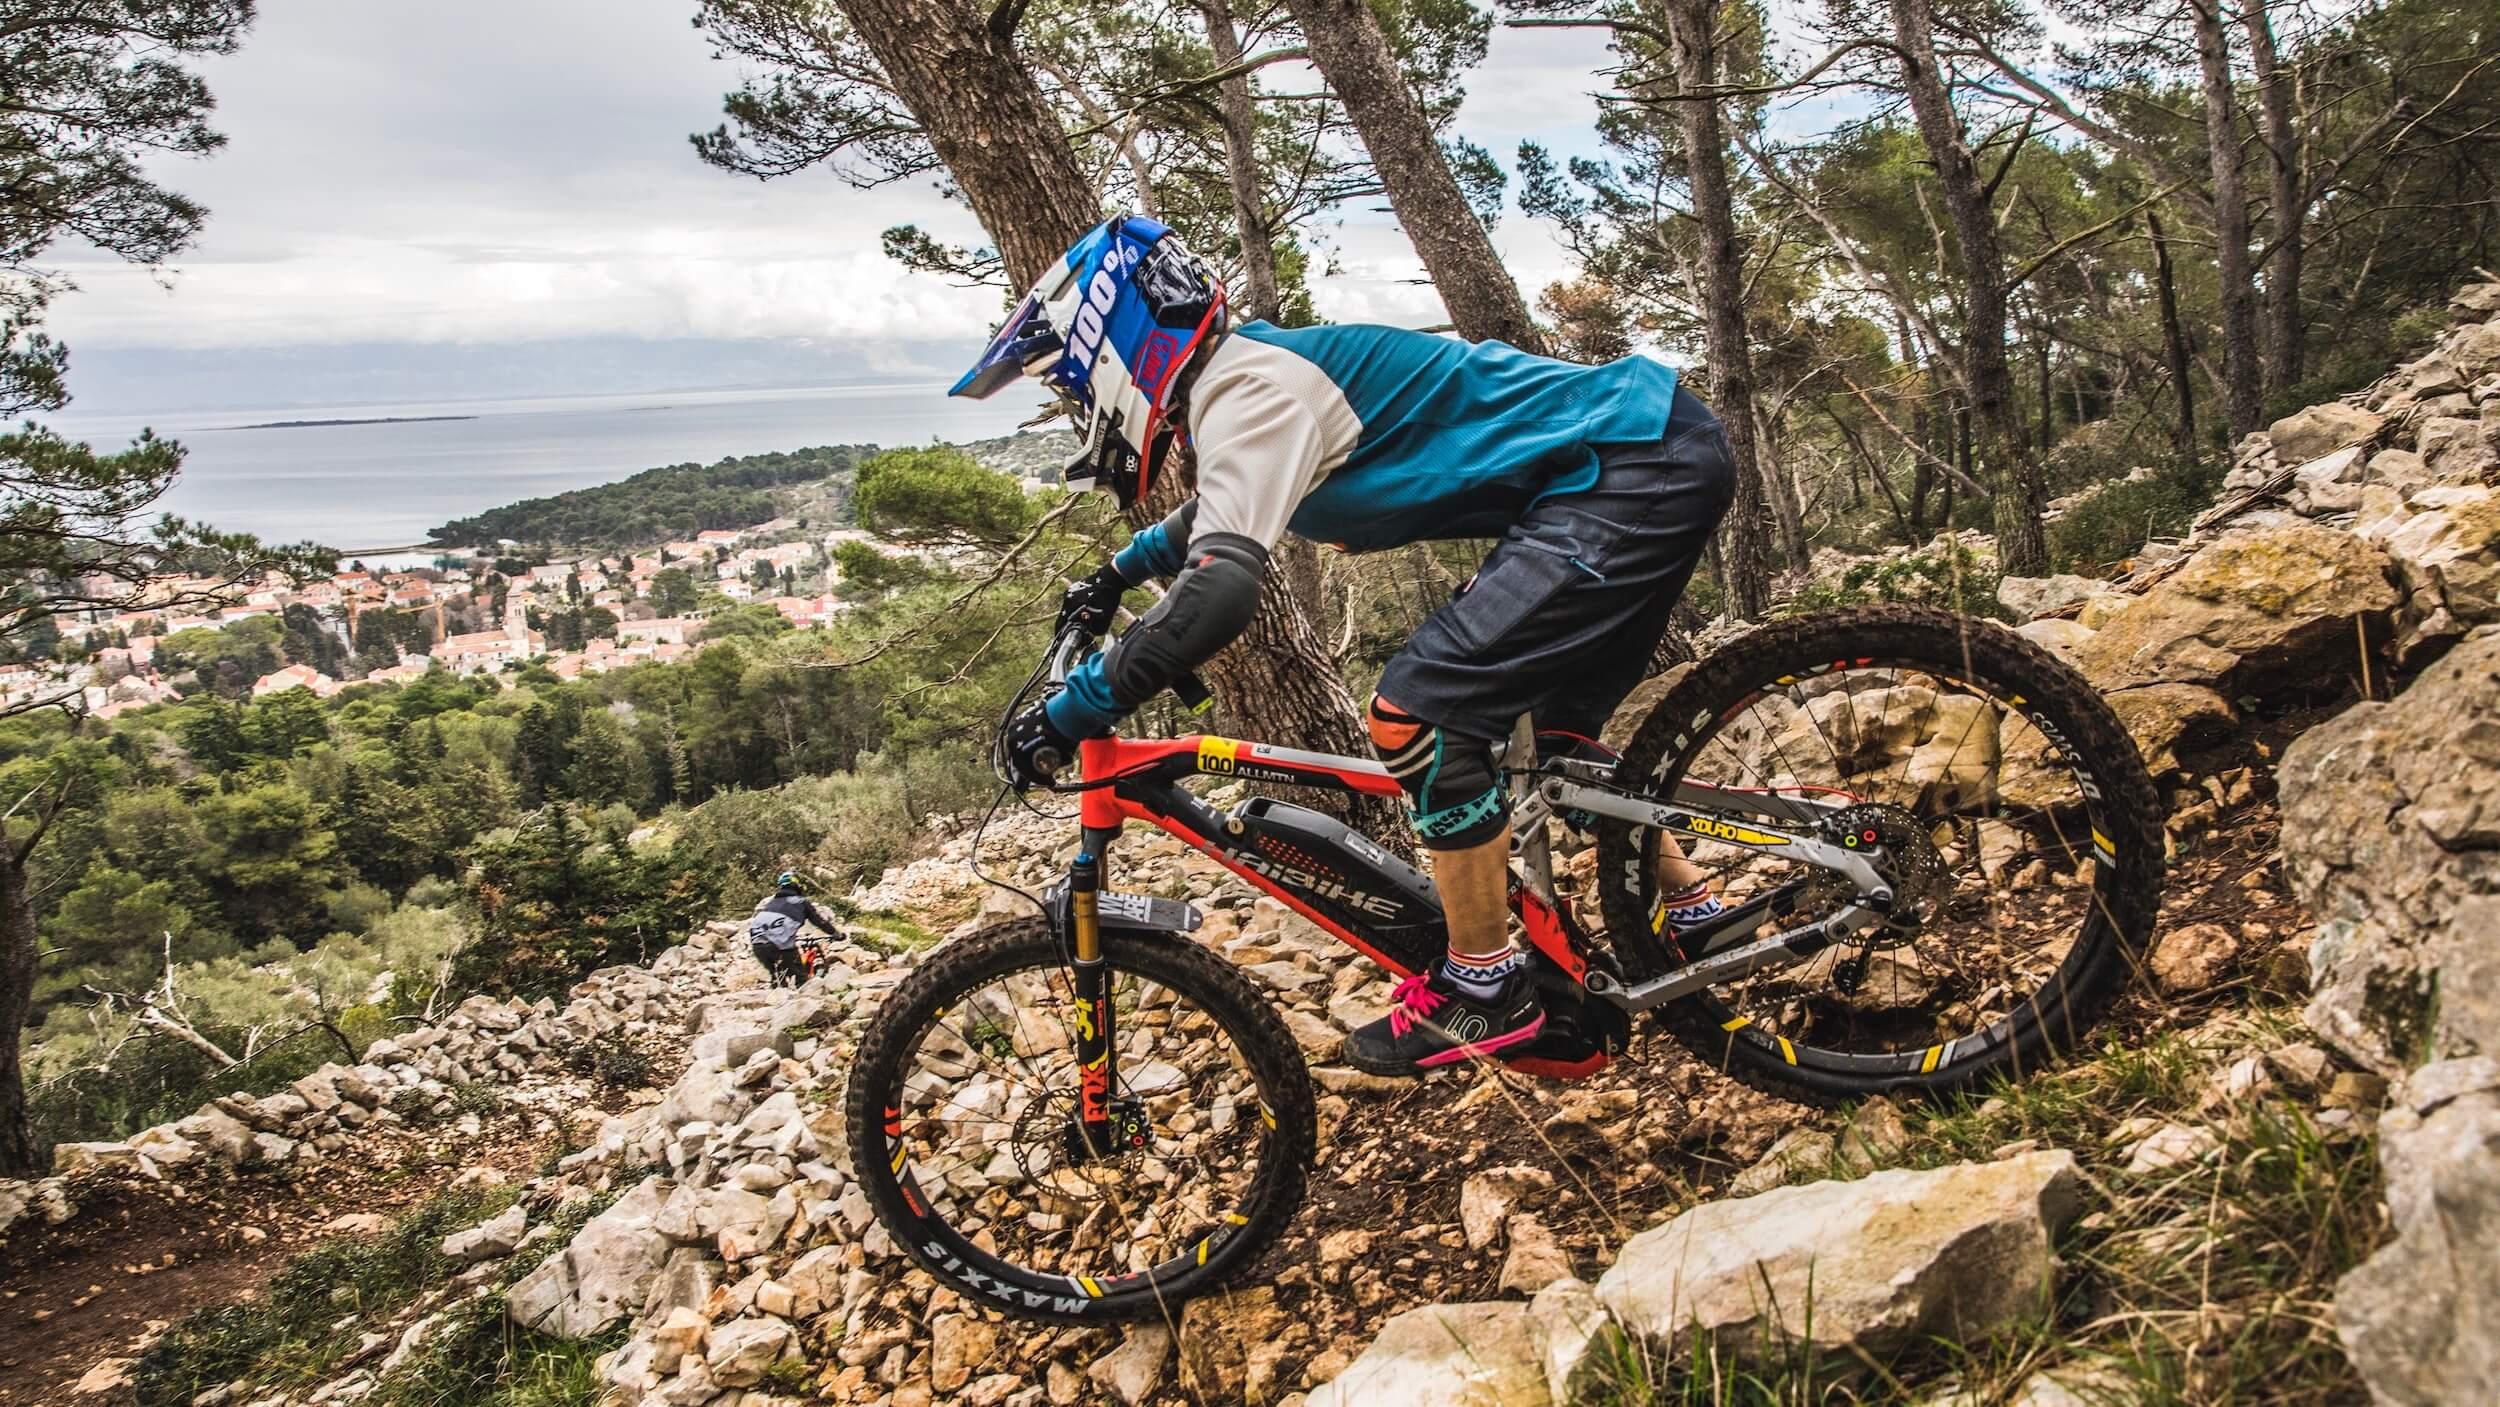 Haibike fully elektrische mountainbike